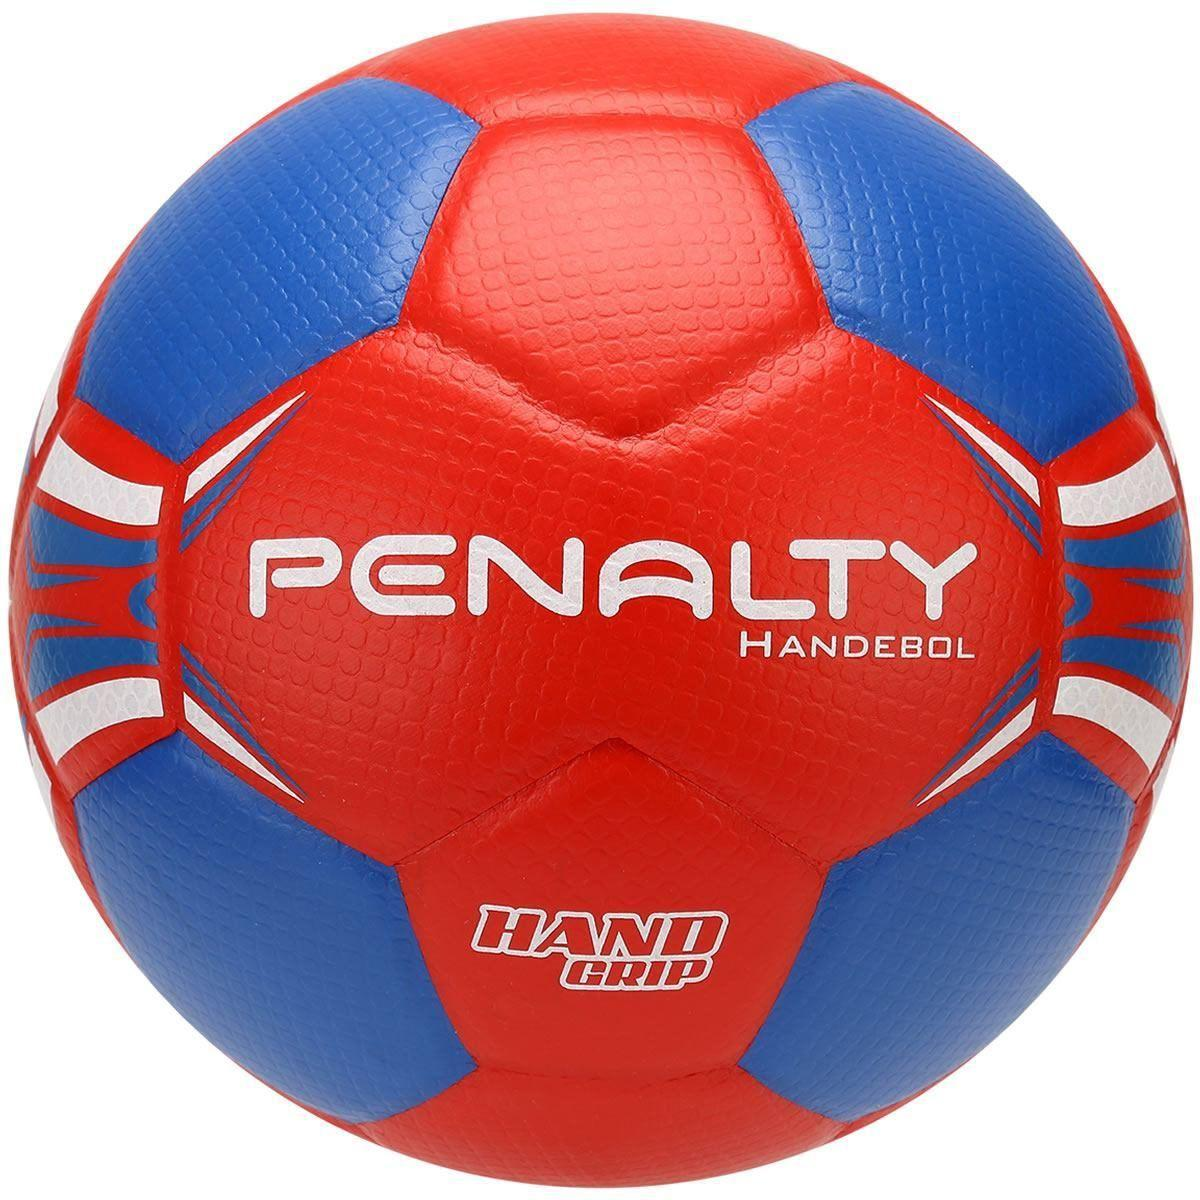 Bola de Handebol Oficial H3L Masculina Pvc Sem Costura - Penalty - Bola de  Handebol - Magazine Luiza 0c0fd1dd4aca3